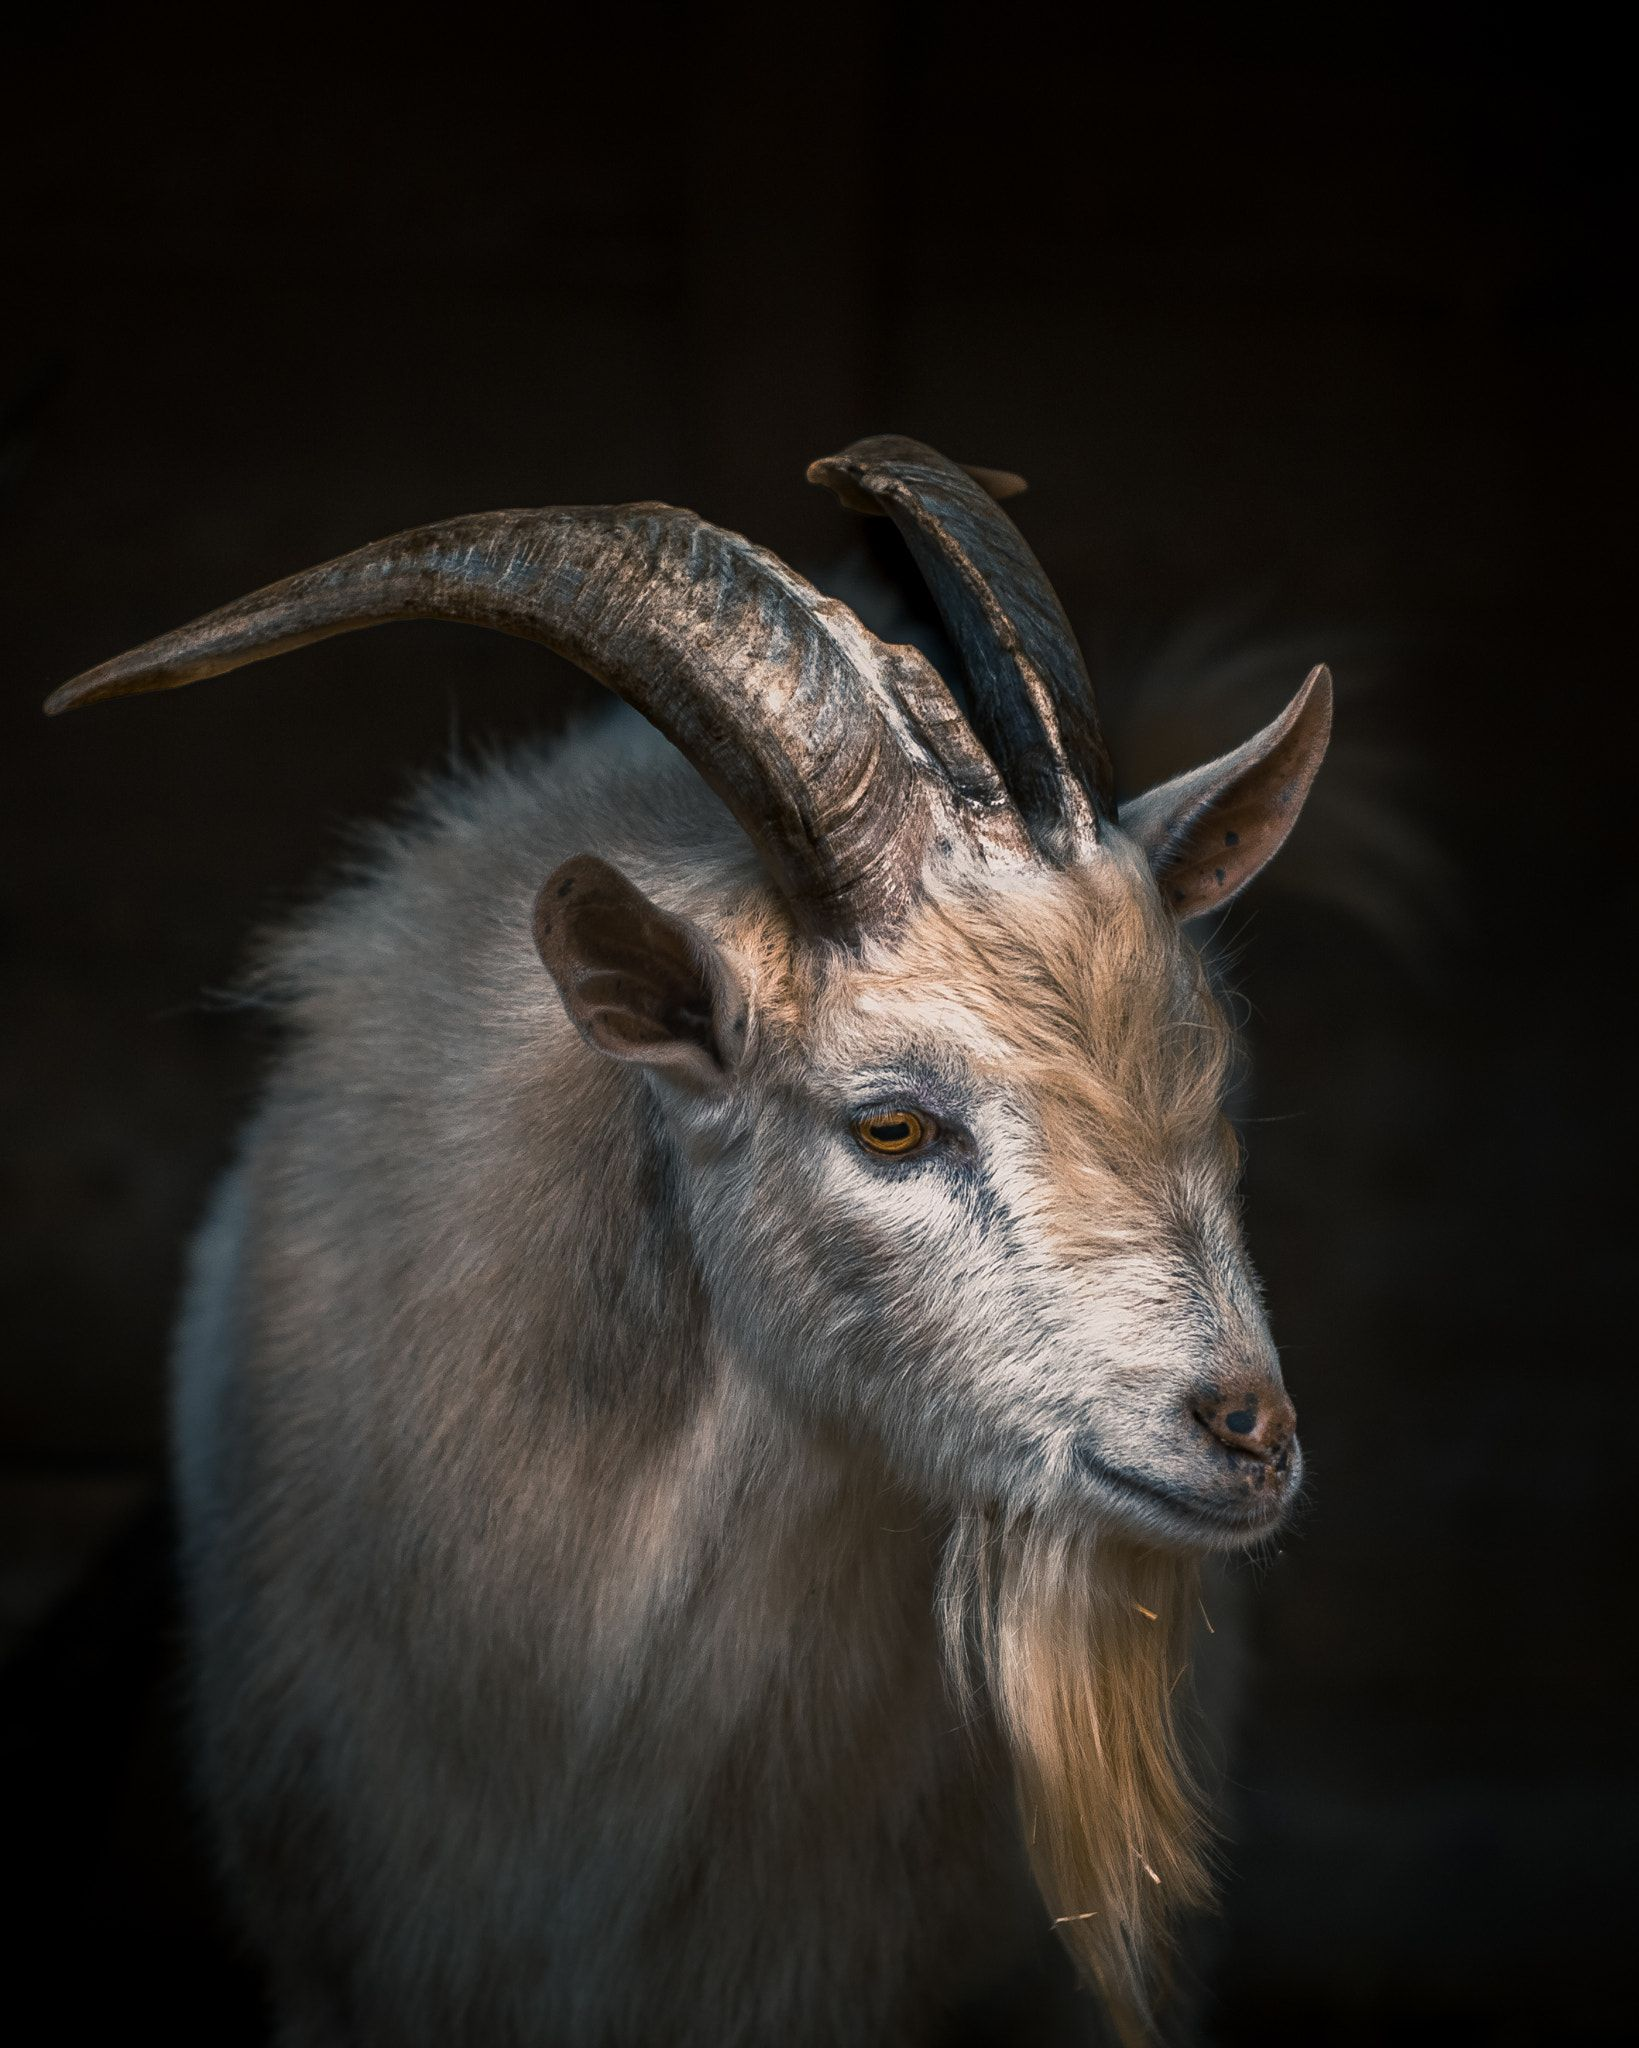 картинка морда козла возрасте двадцати одного